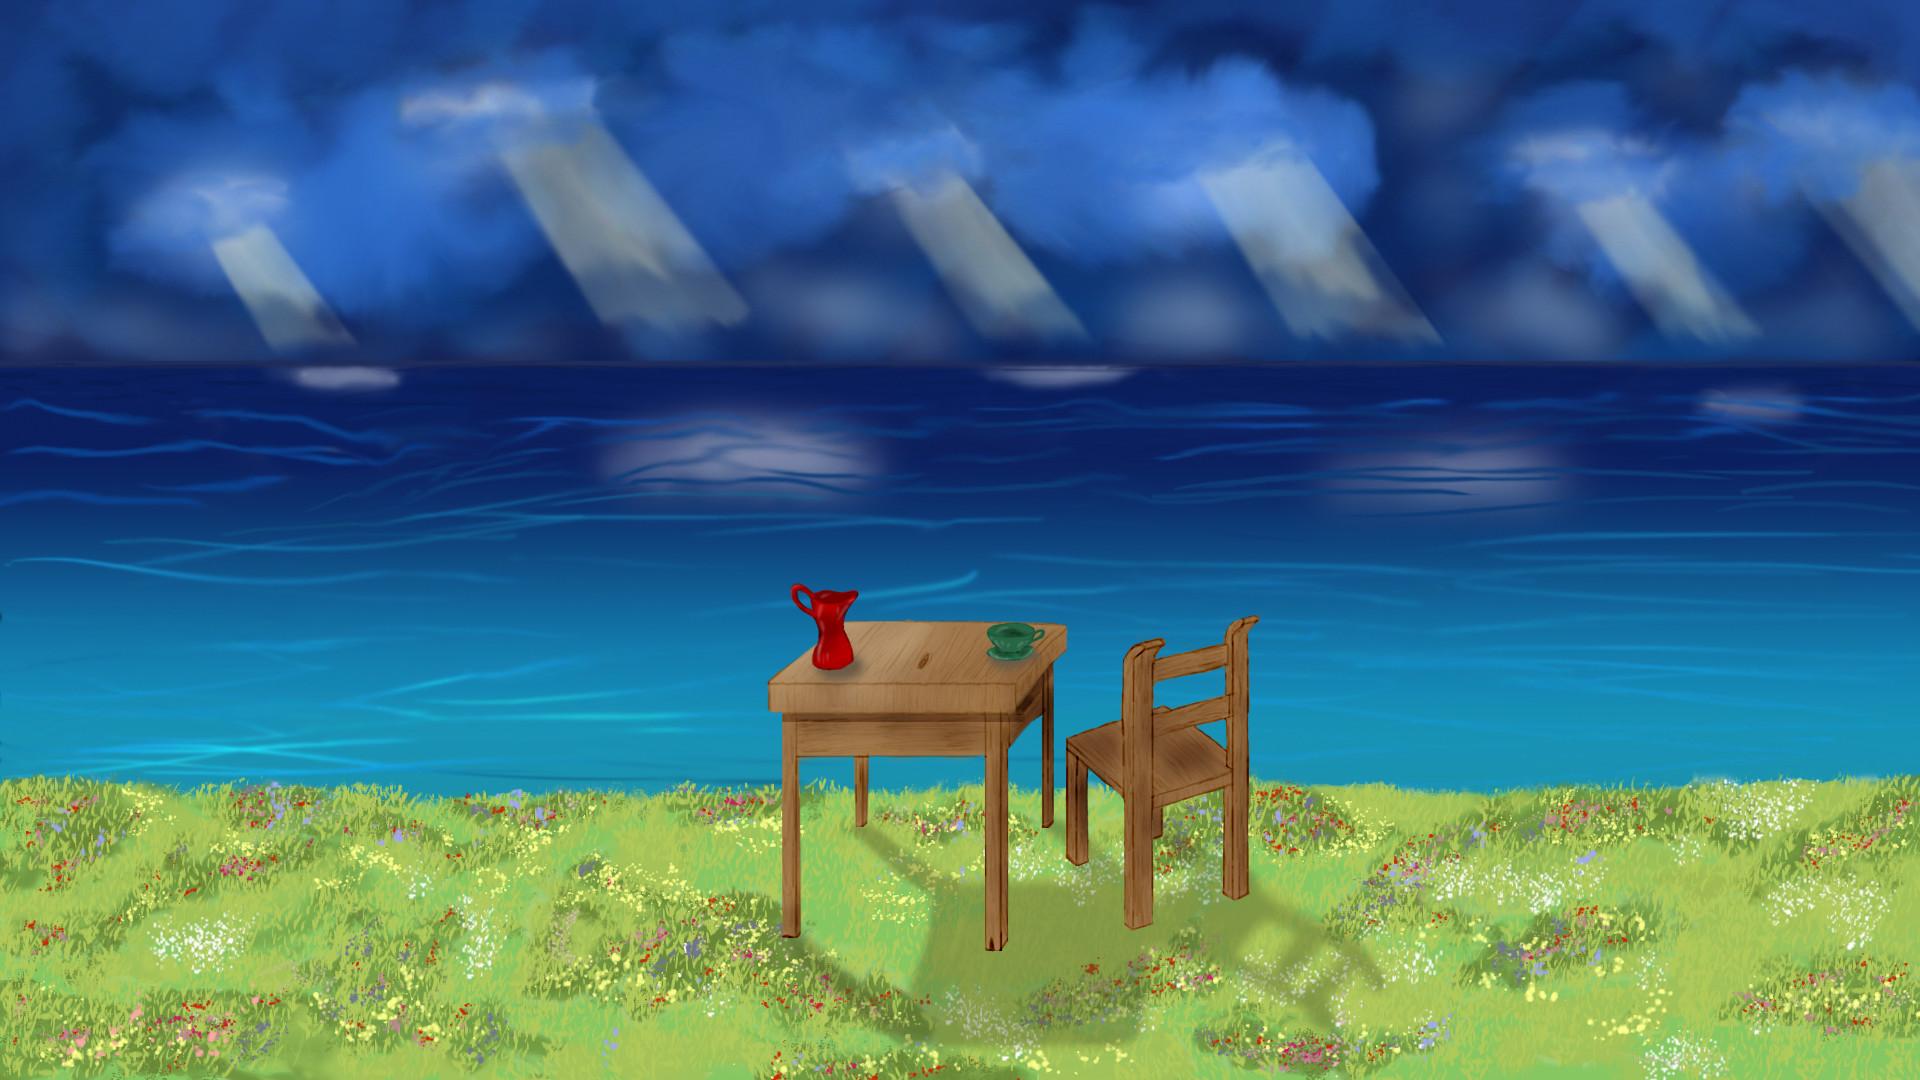 … Howl's moving castle lake scene by Tao-Seven